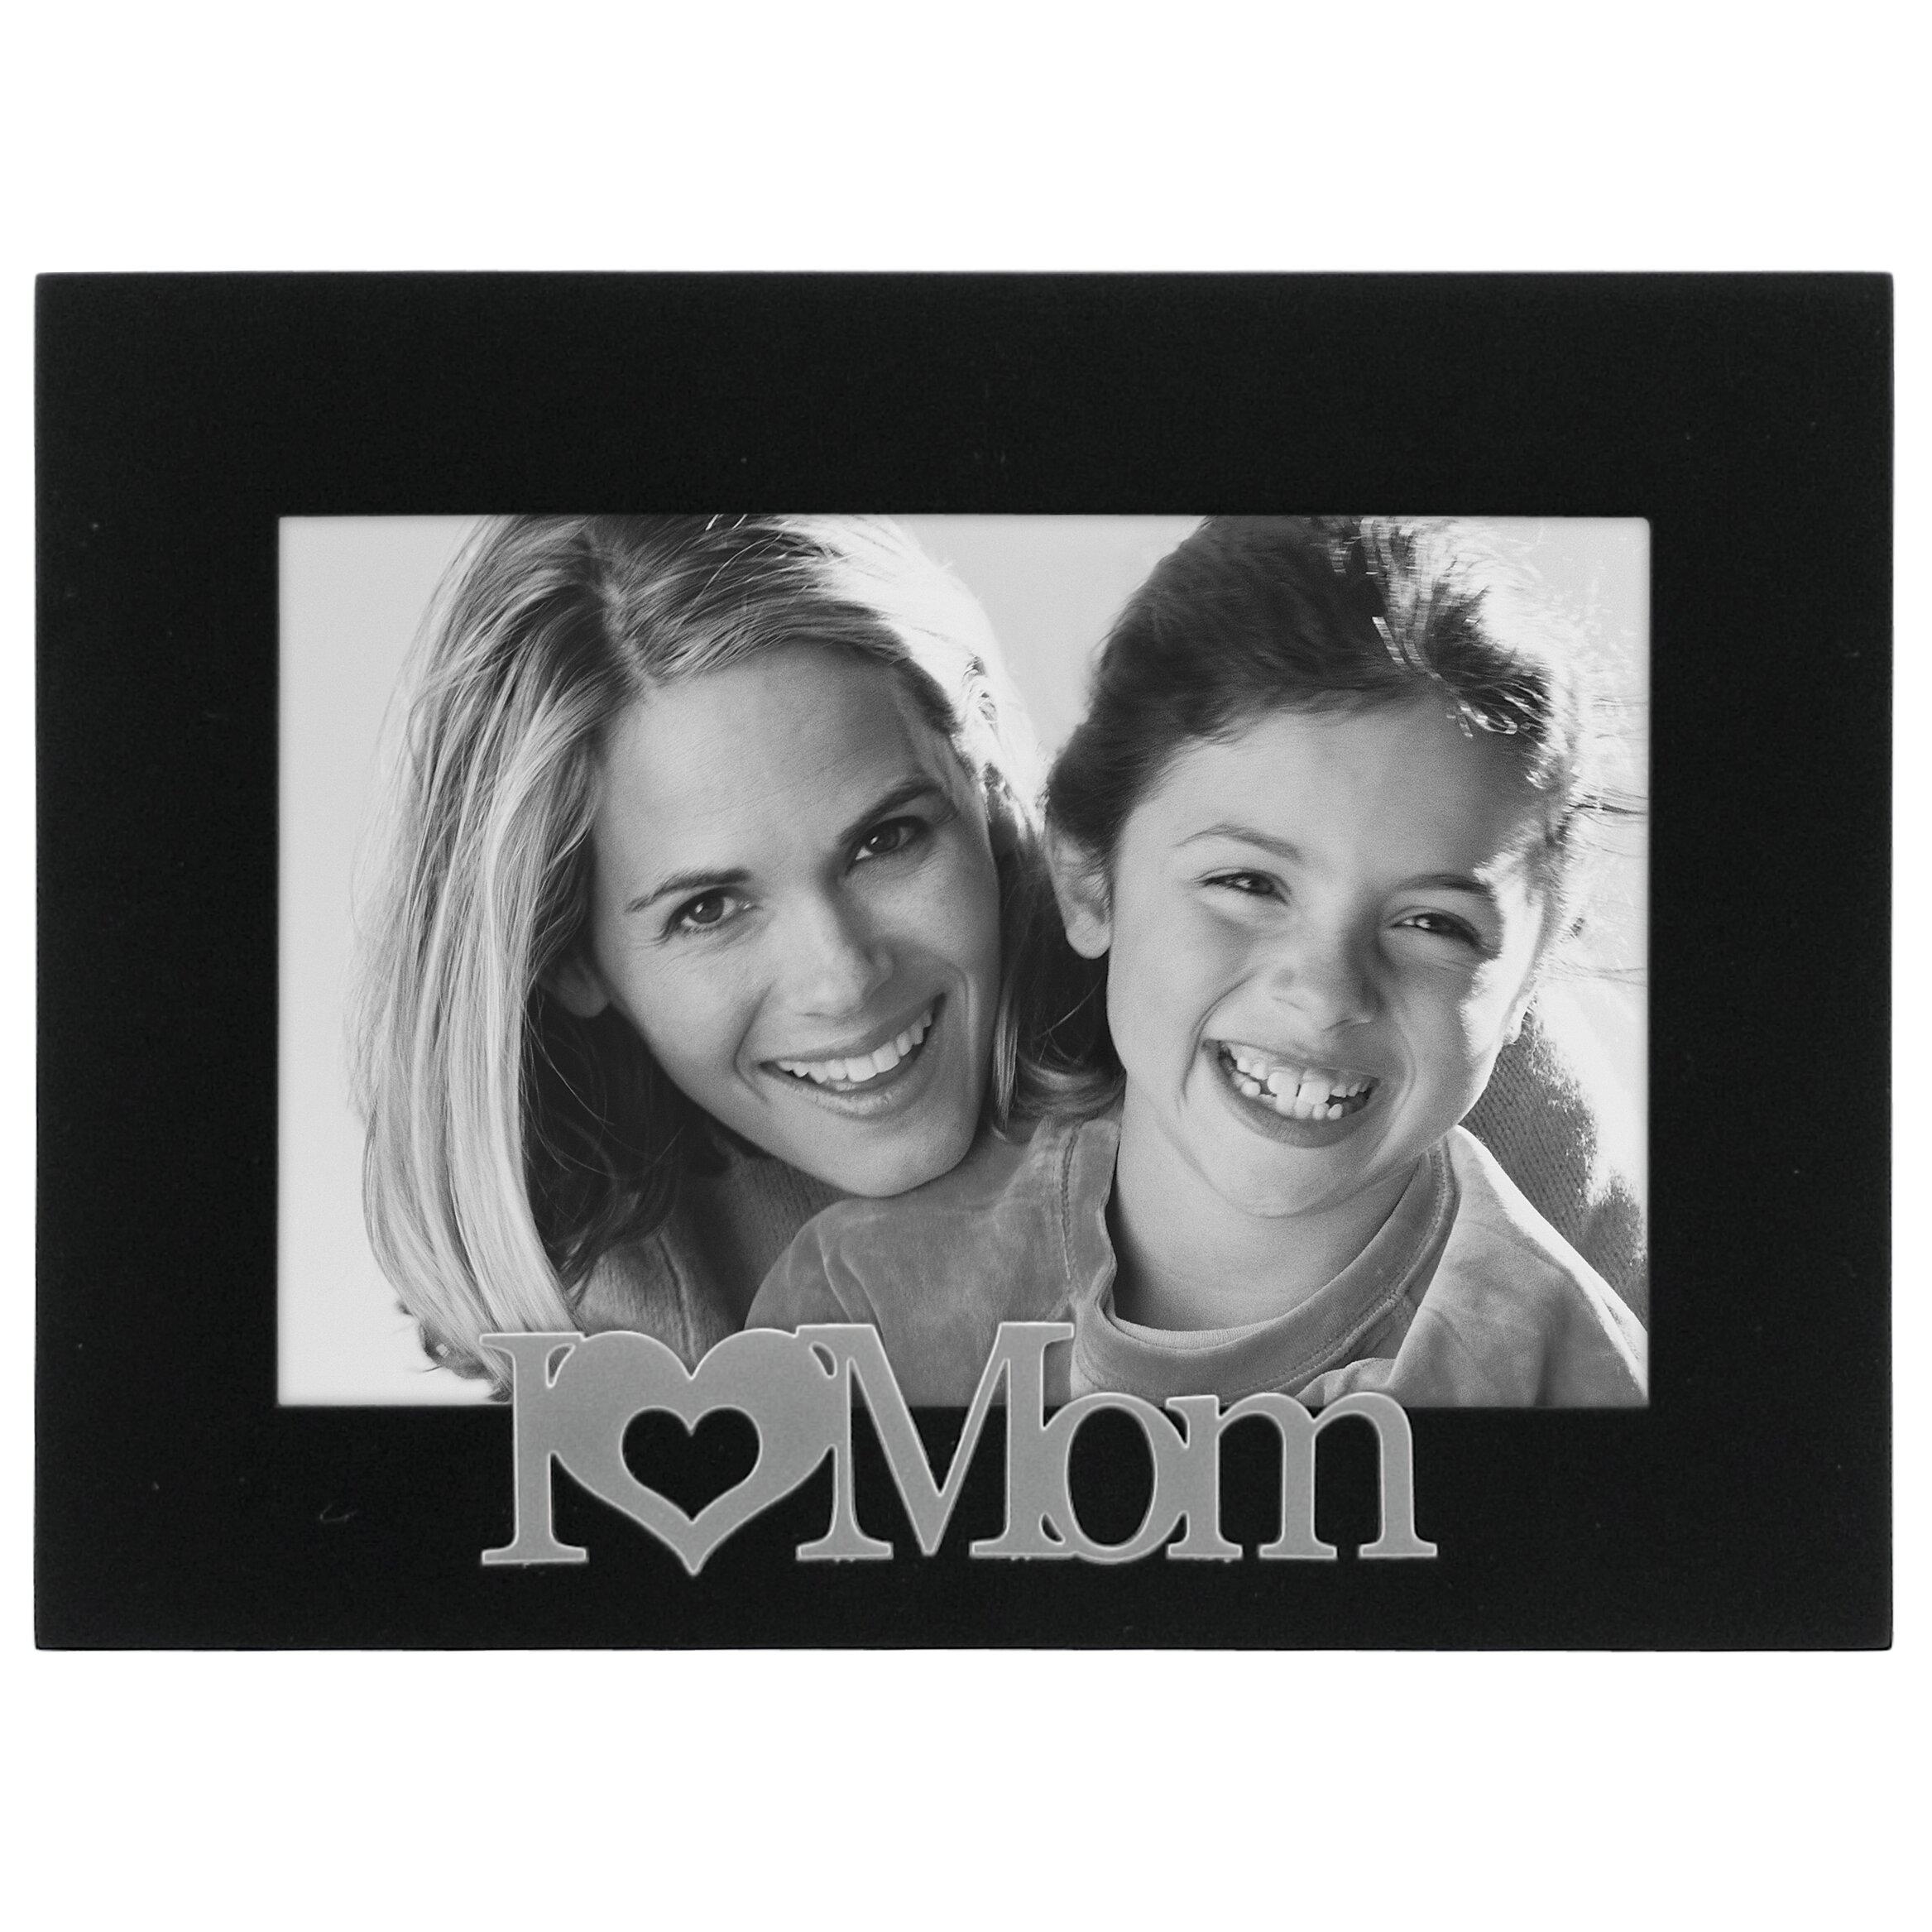 malden expressions i love mom picture frame